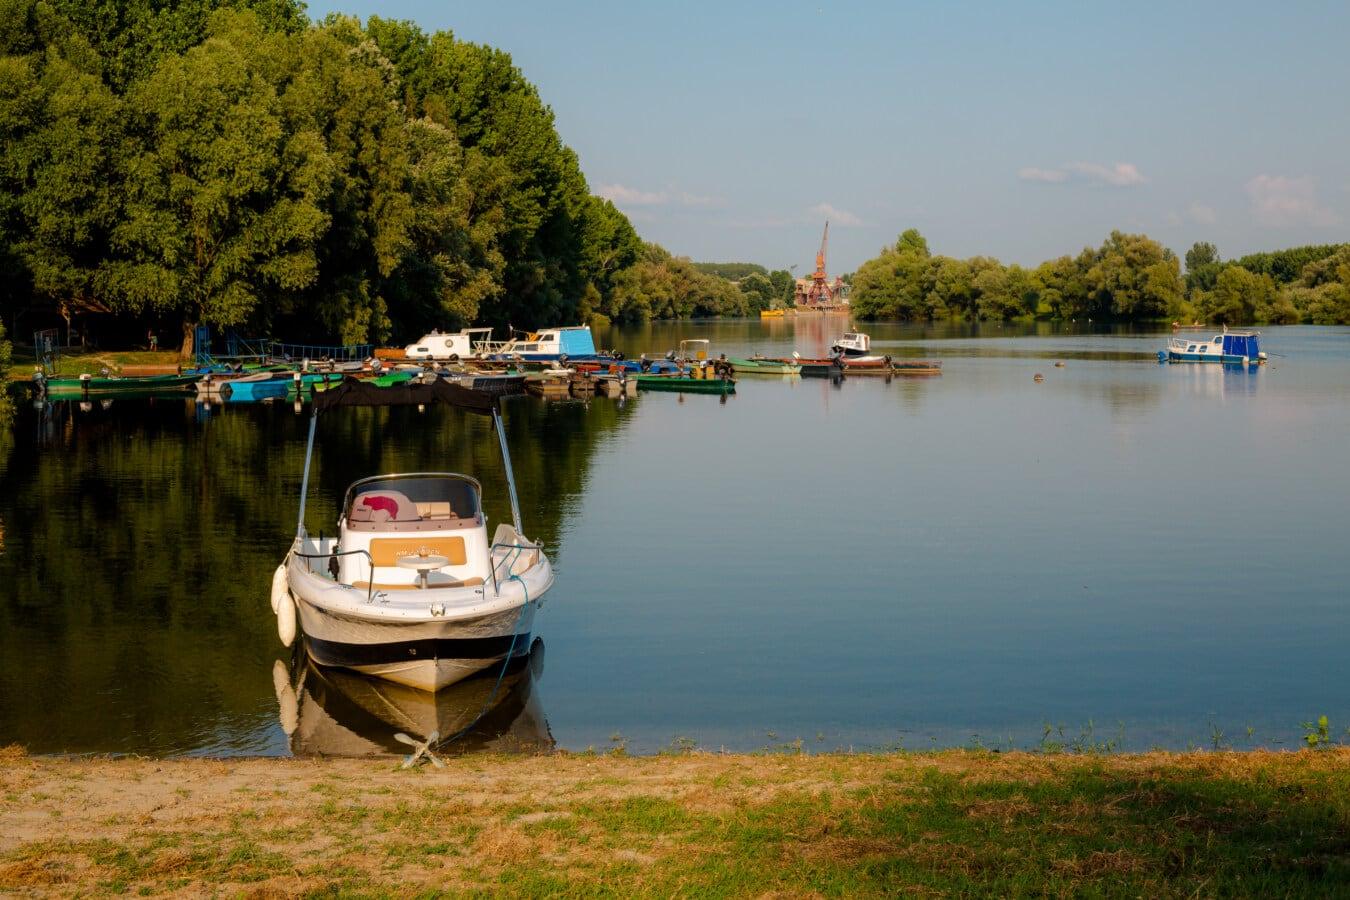 speedboat, motorboat, lakeside, boat, water, shed, shore, boats, landscape, river